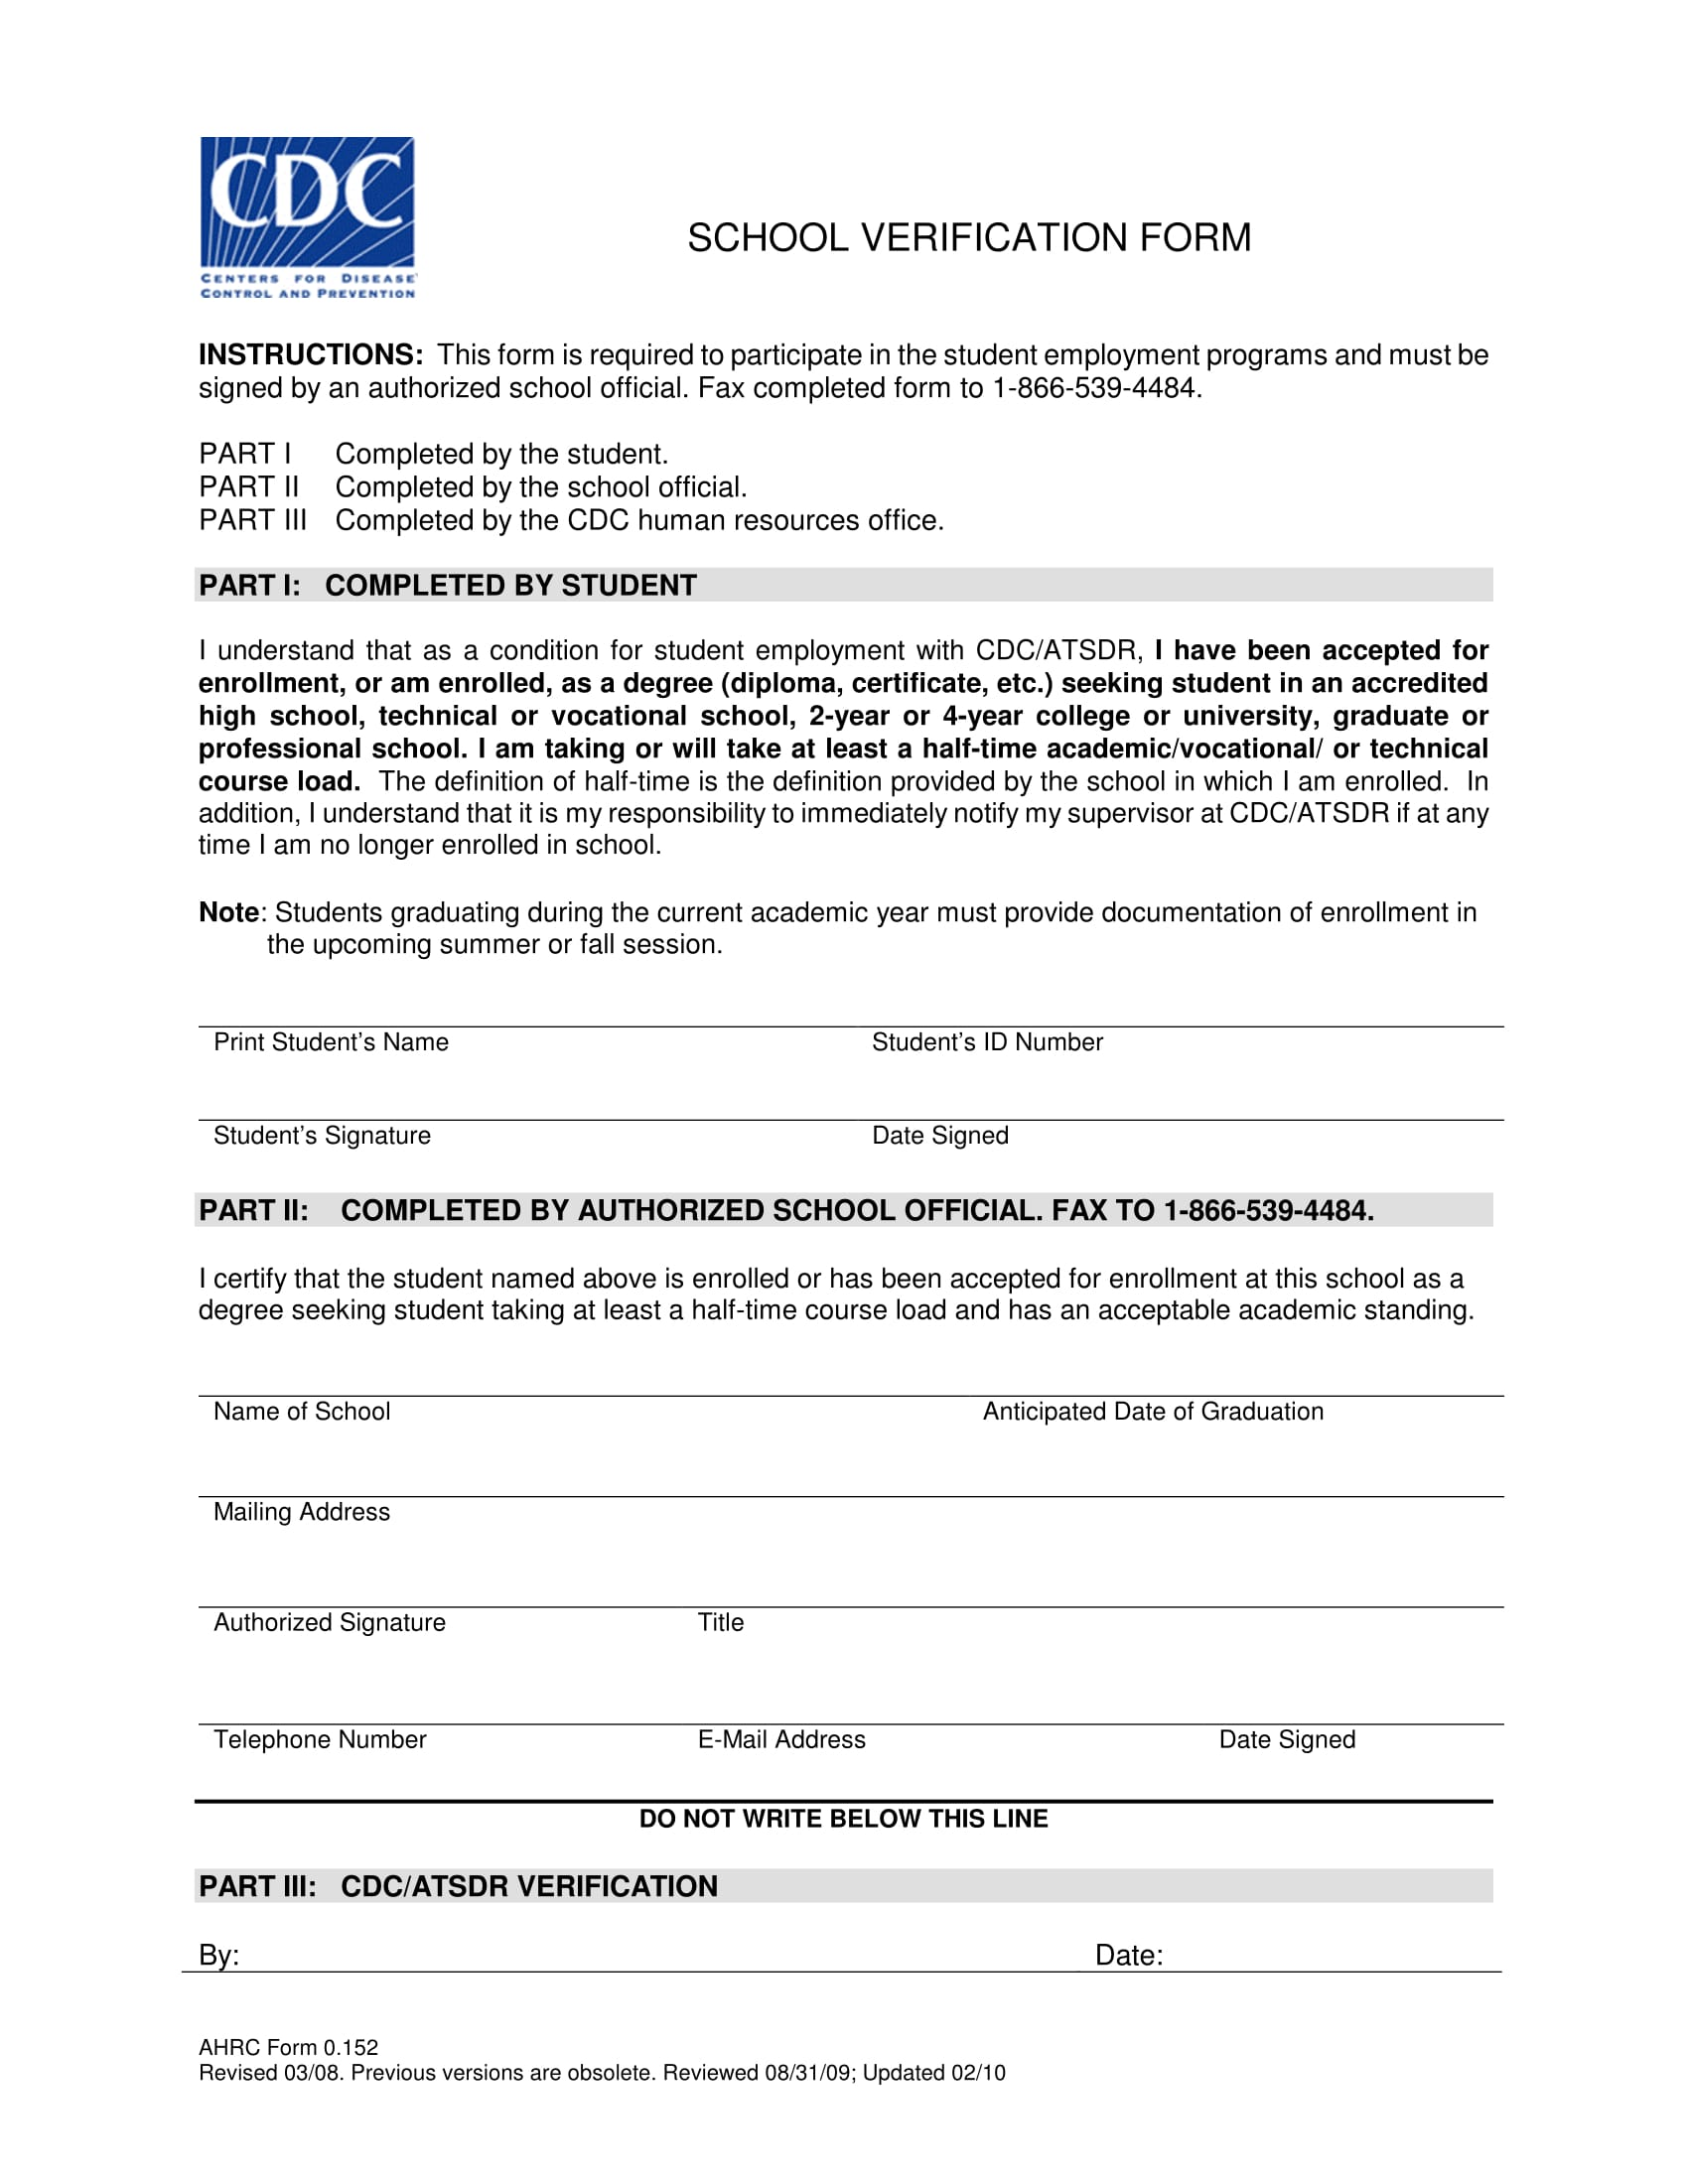 school verification form 1